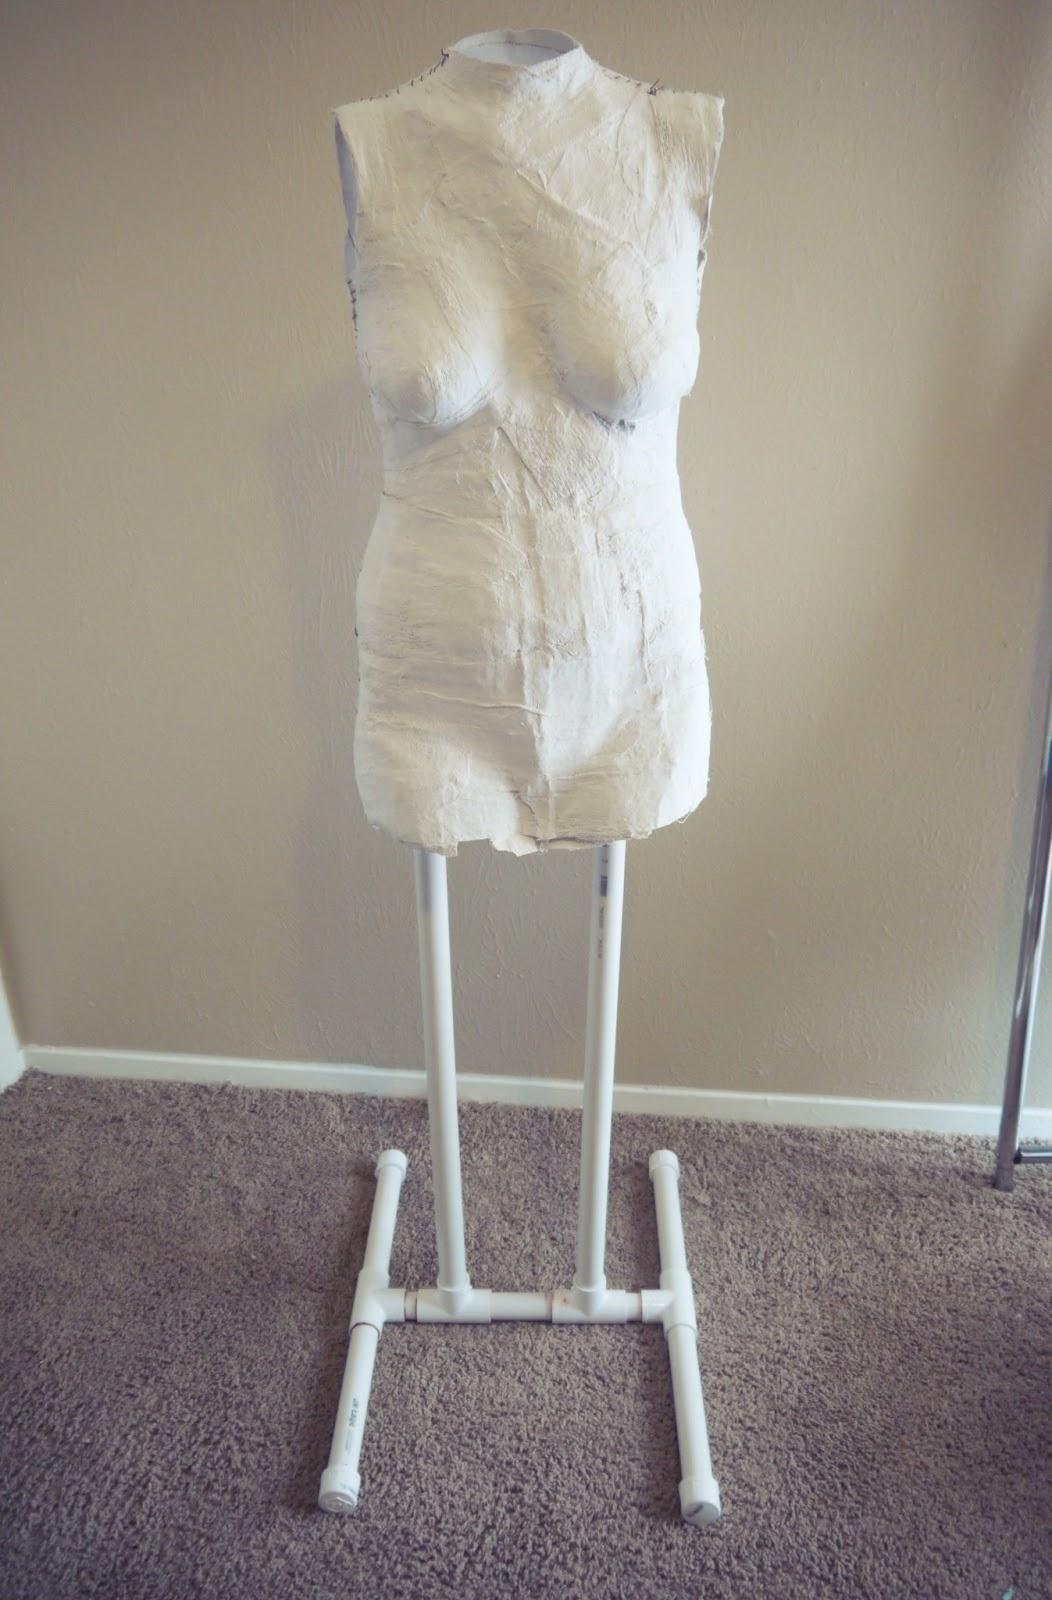 katastrophic: DIY Dress Form Tutorial Part 2: Building the